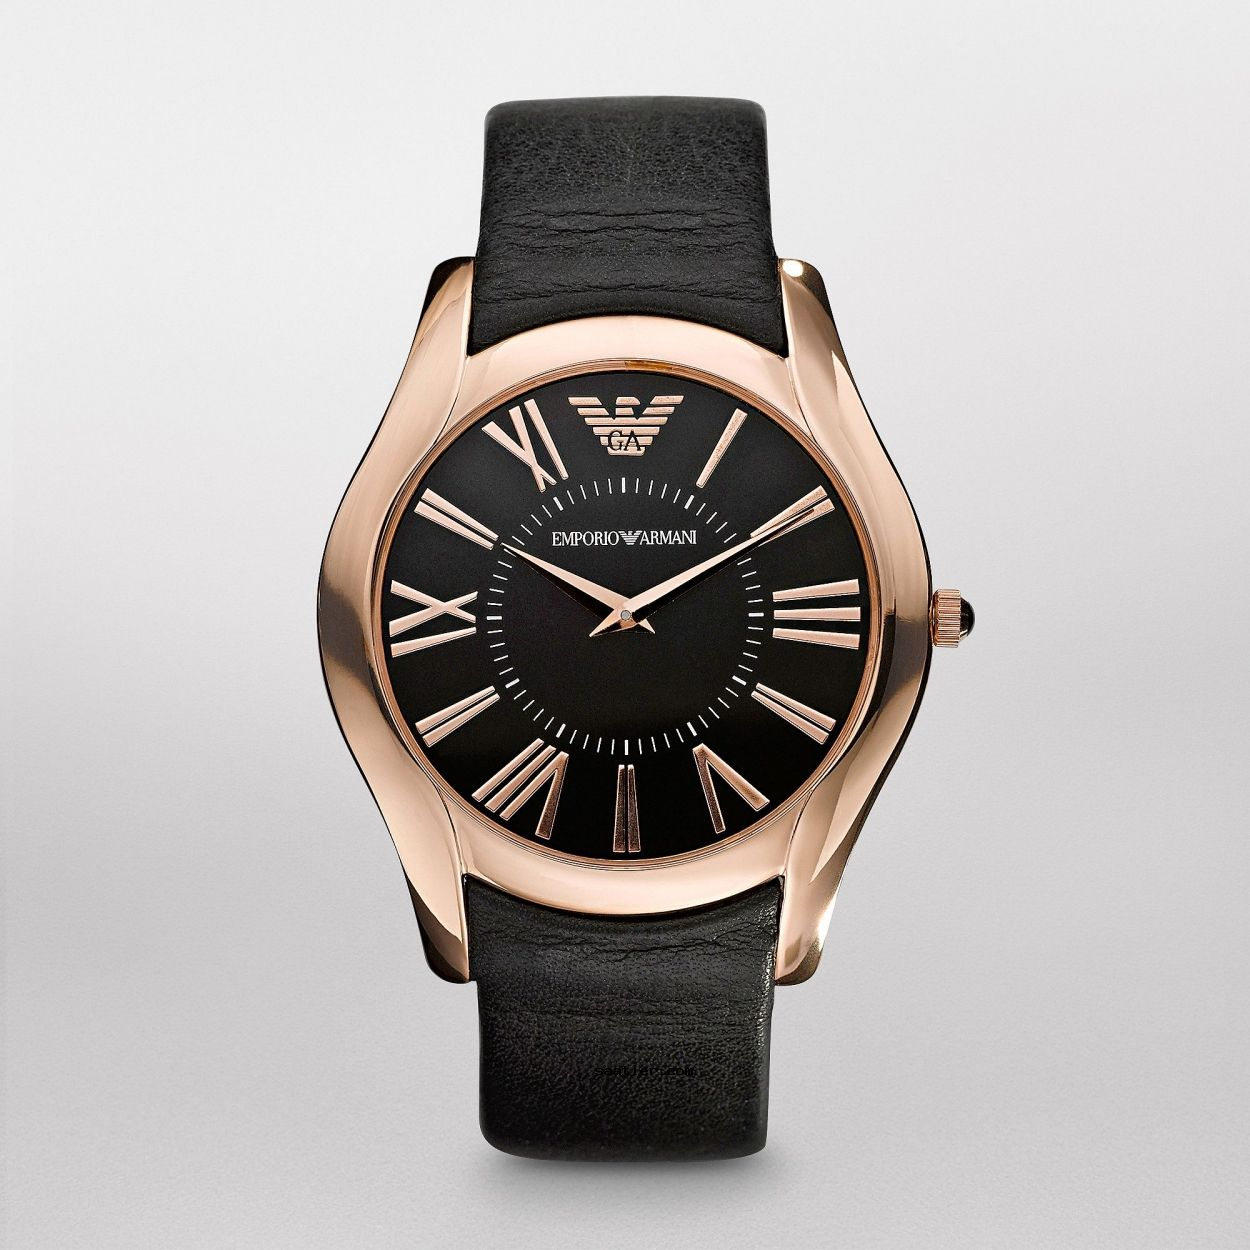 Emporio Armani Ar2043 Erkek Kol Saati Womens Watches Casual Watches Leather Watch